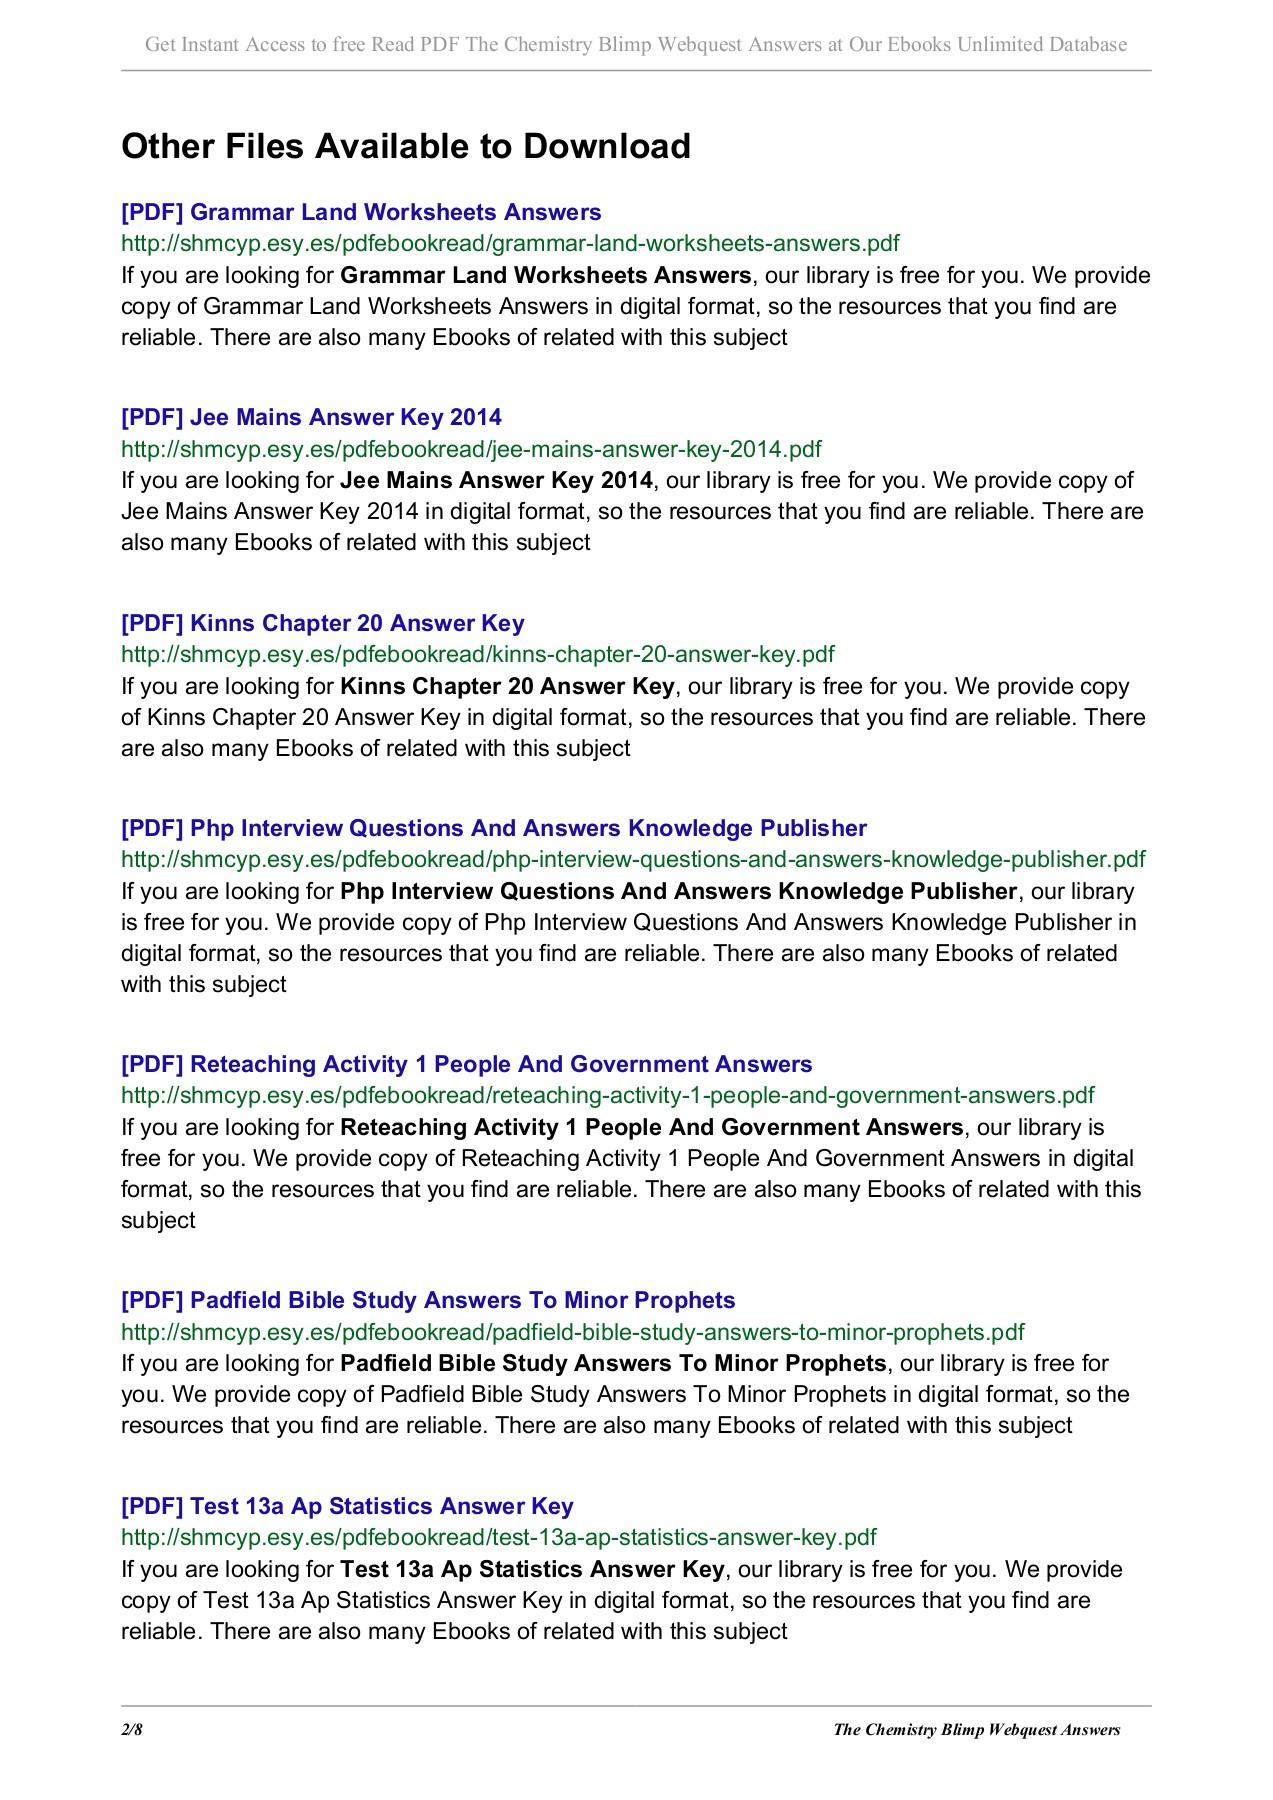 Geologic Time Webquest Worksheet Answers